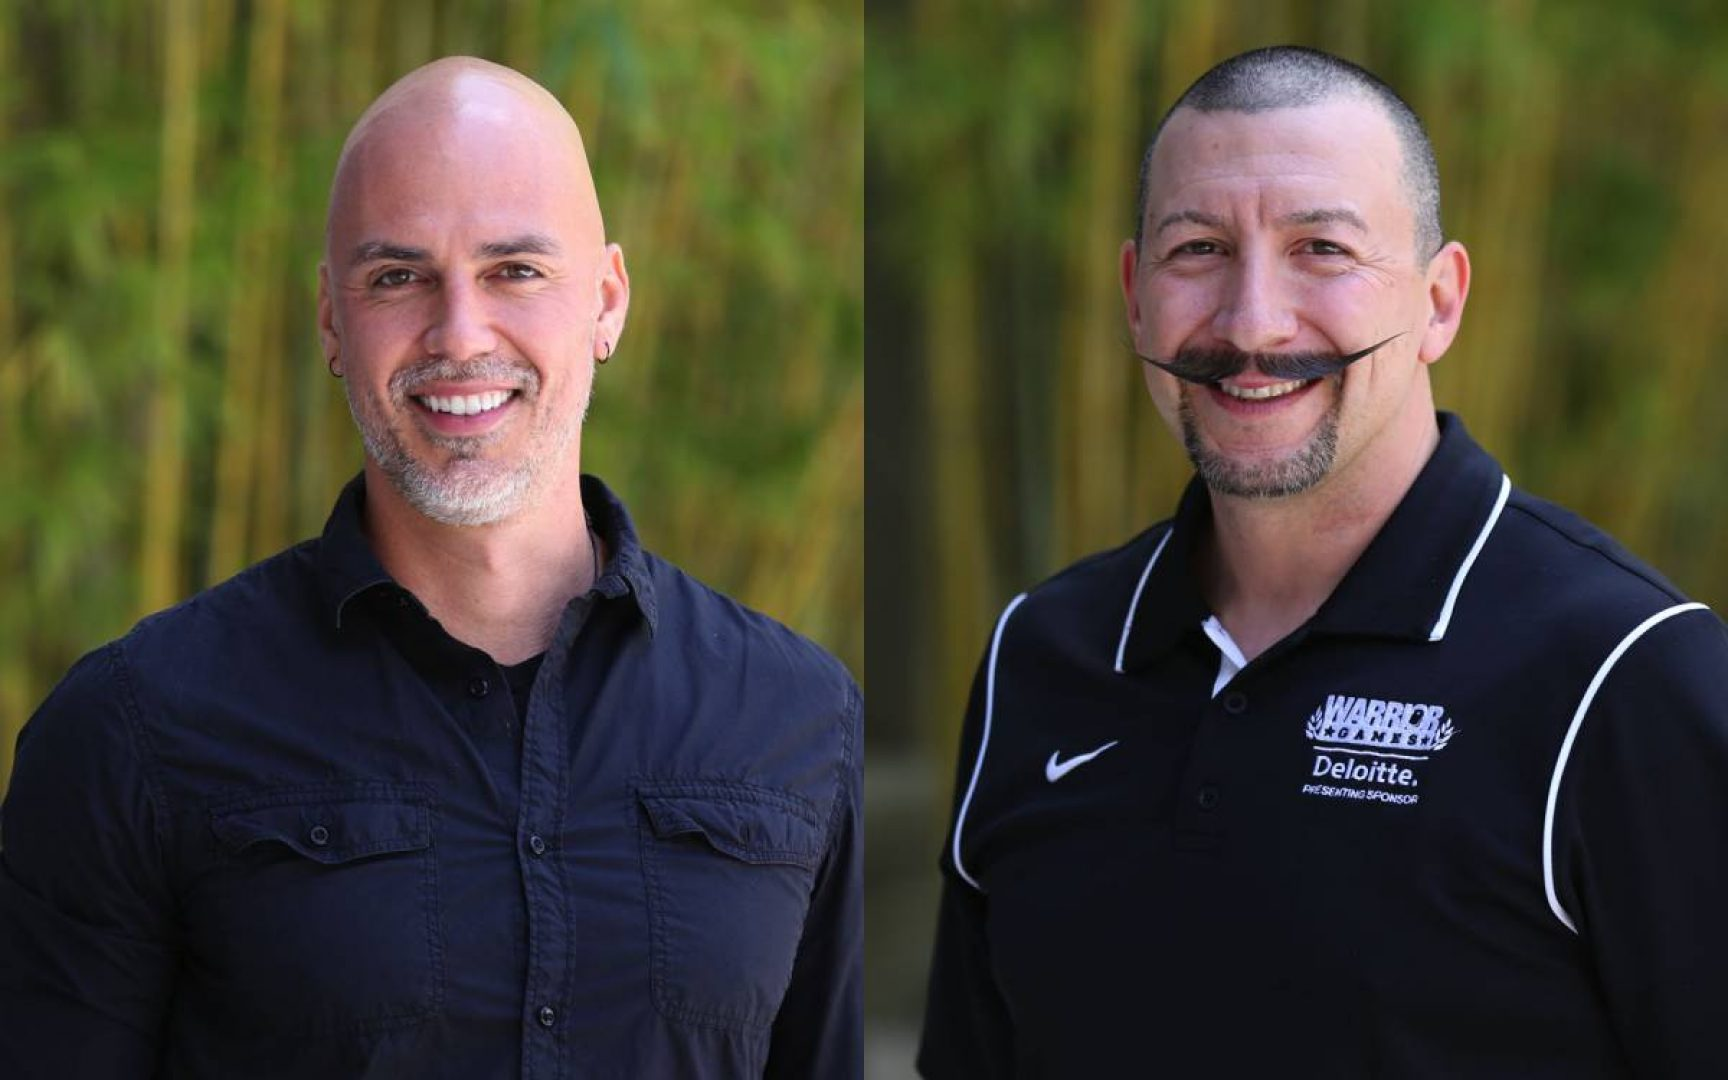 Jorge Avalos (right) and Jason McNamara benefitted from Warrington's Veterans Entrepreneurship Program.